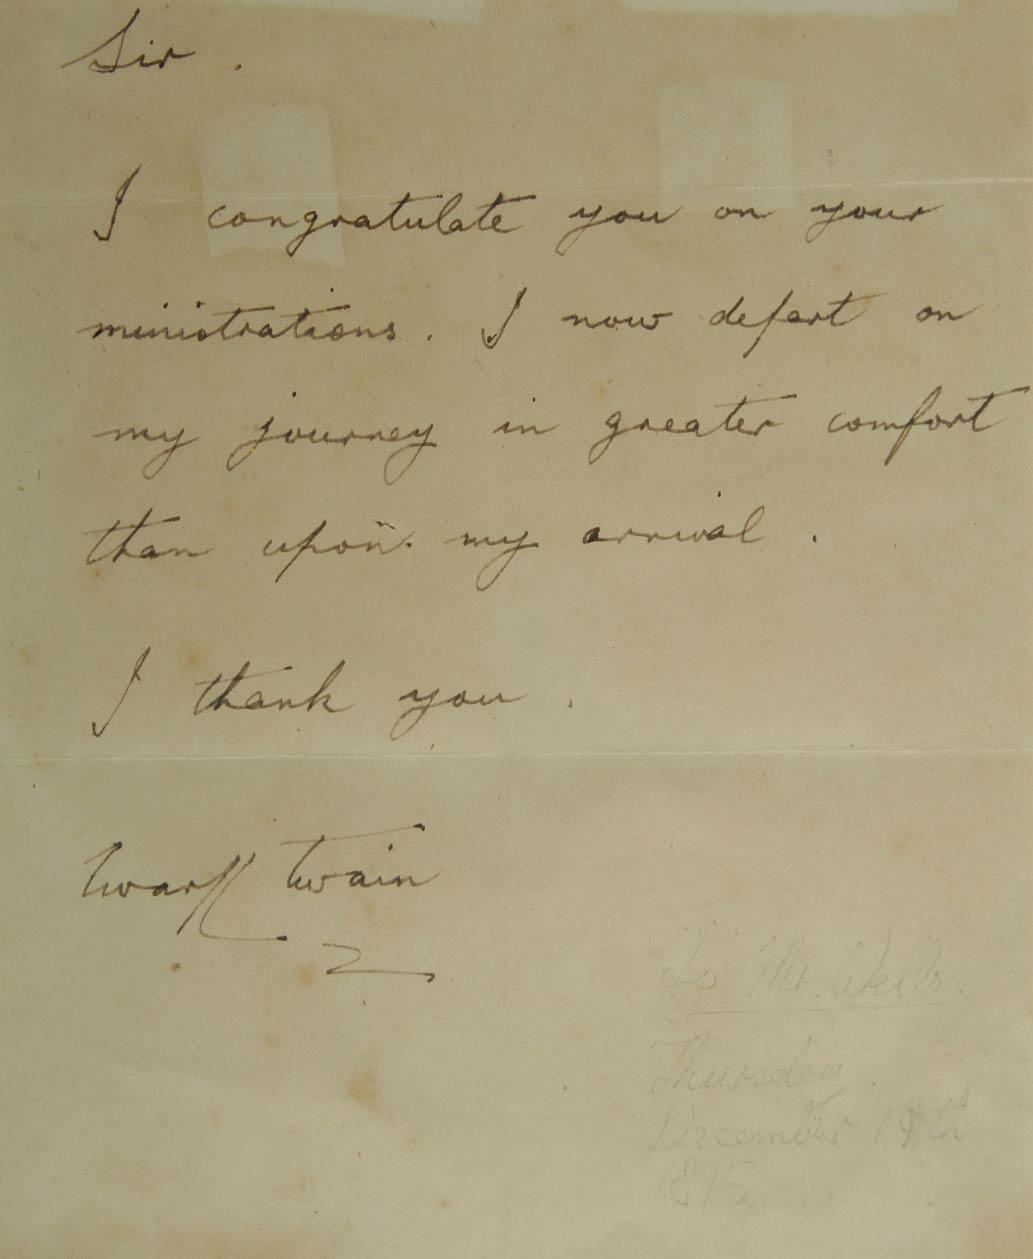 Twain to dentist Wells, Thursday 19 December 1895